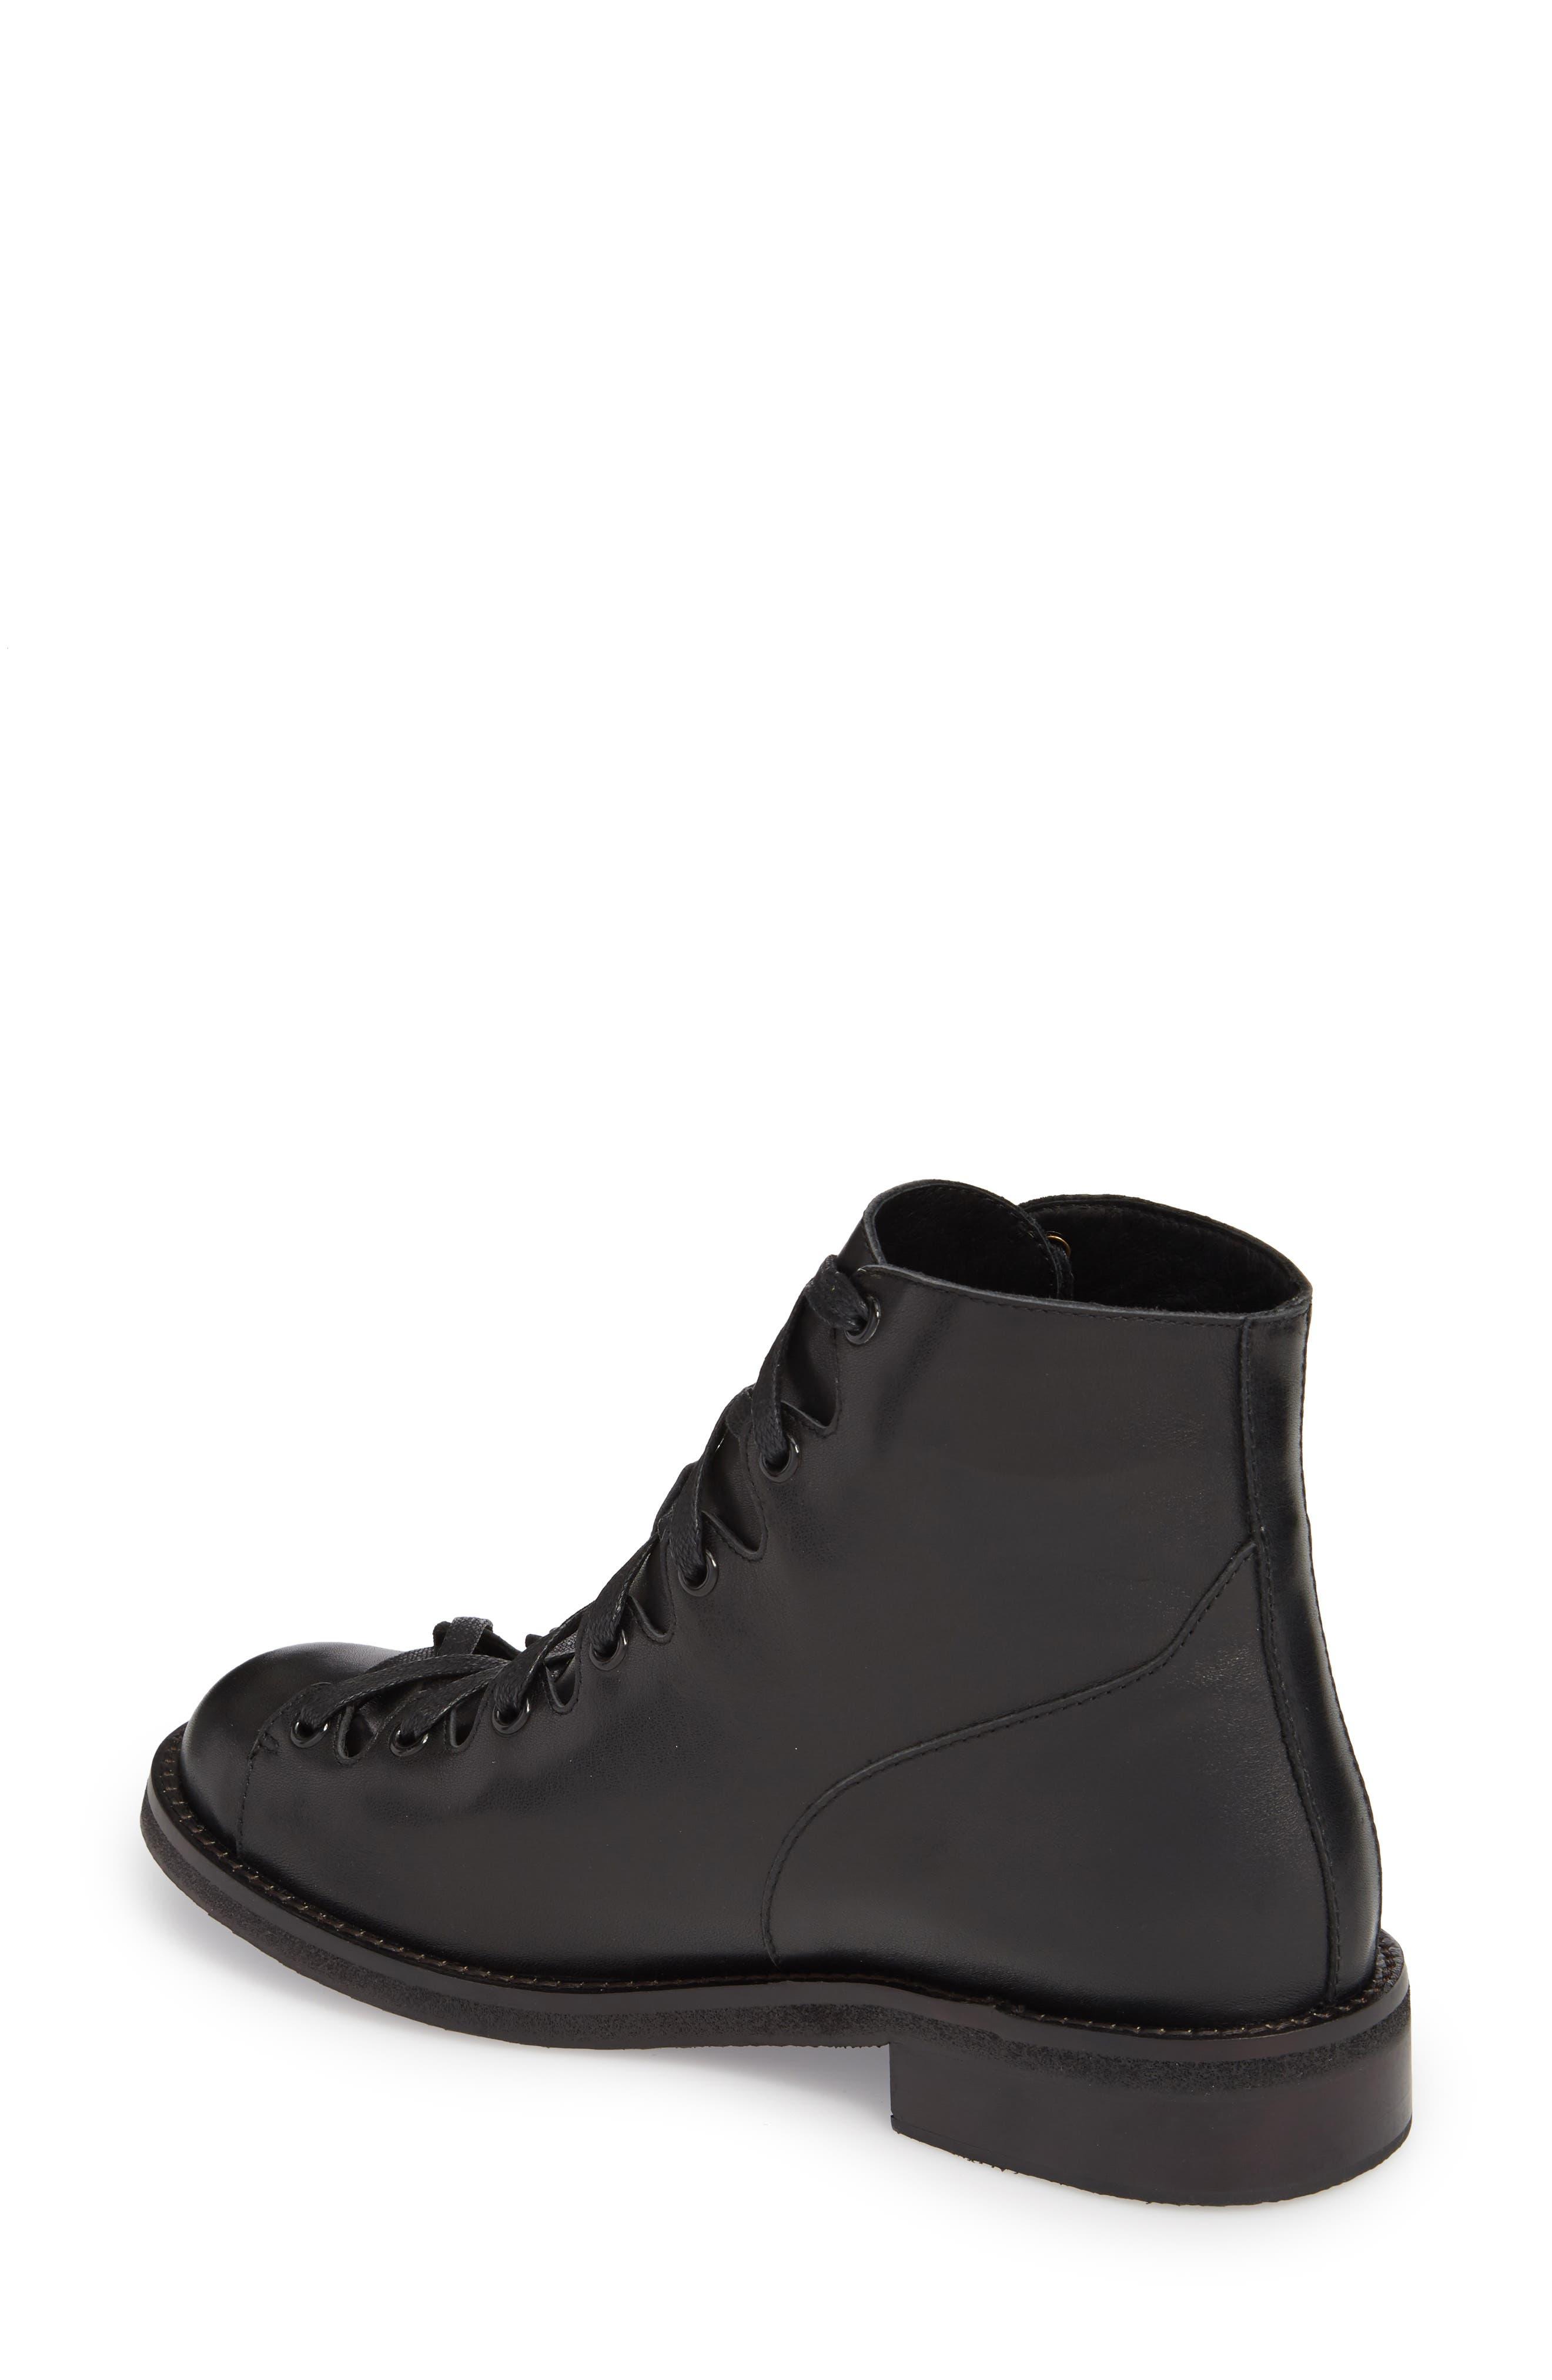 Jess Ghillie Combat Boot,                             Alternate thumbnail 2, color,                             Black Leather